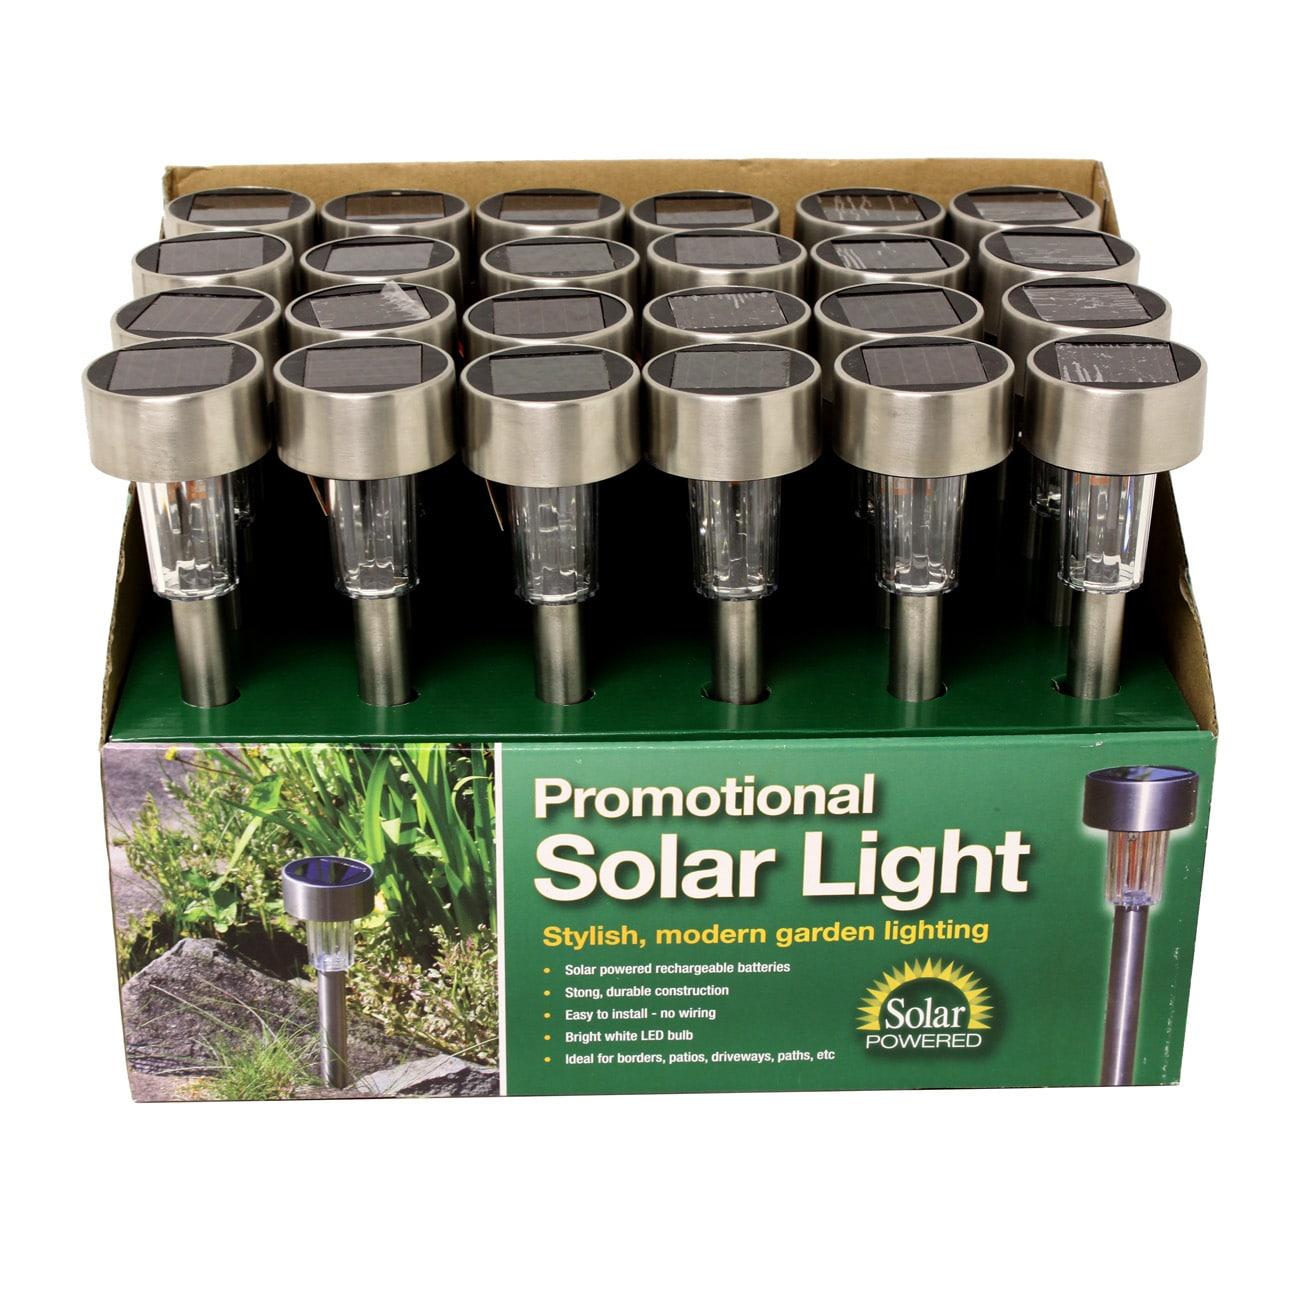 Pics s Outdoor Solar Garden Lights Are Increasingly